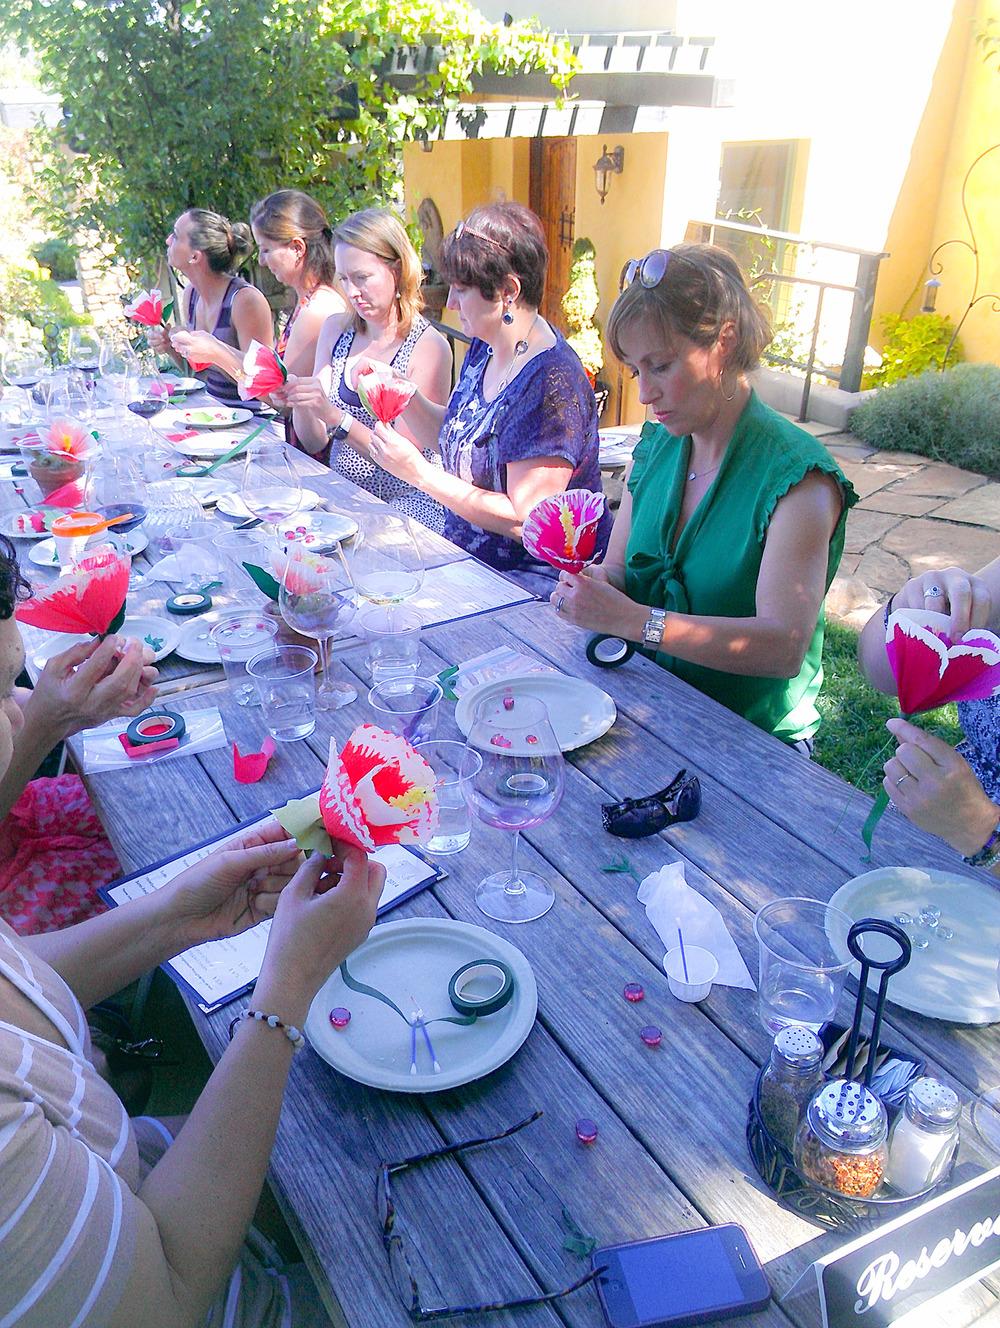 Flower crafting at Dancin Vineyards—making memories.